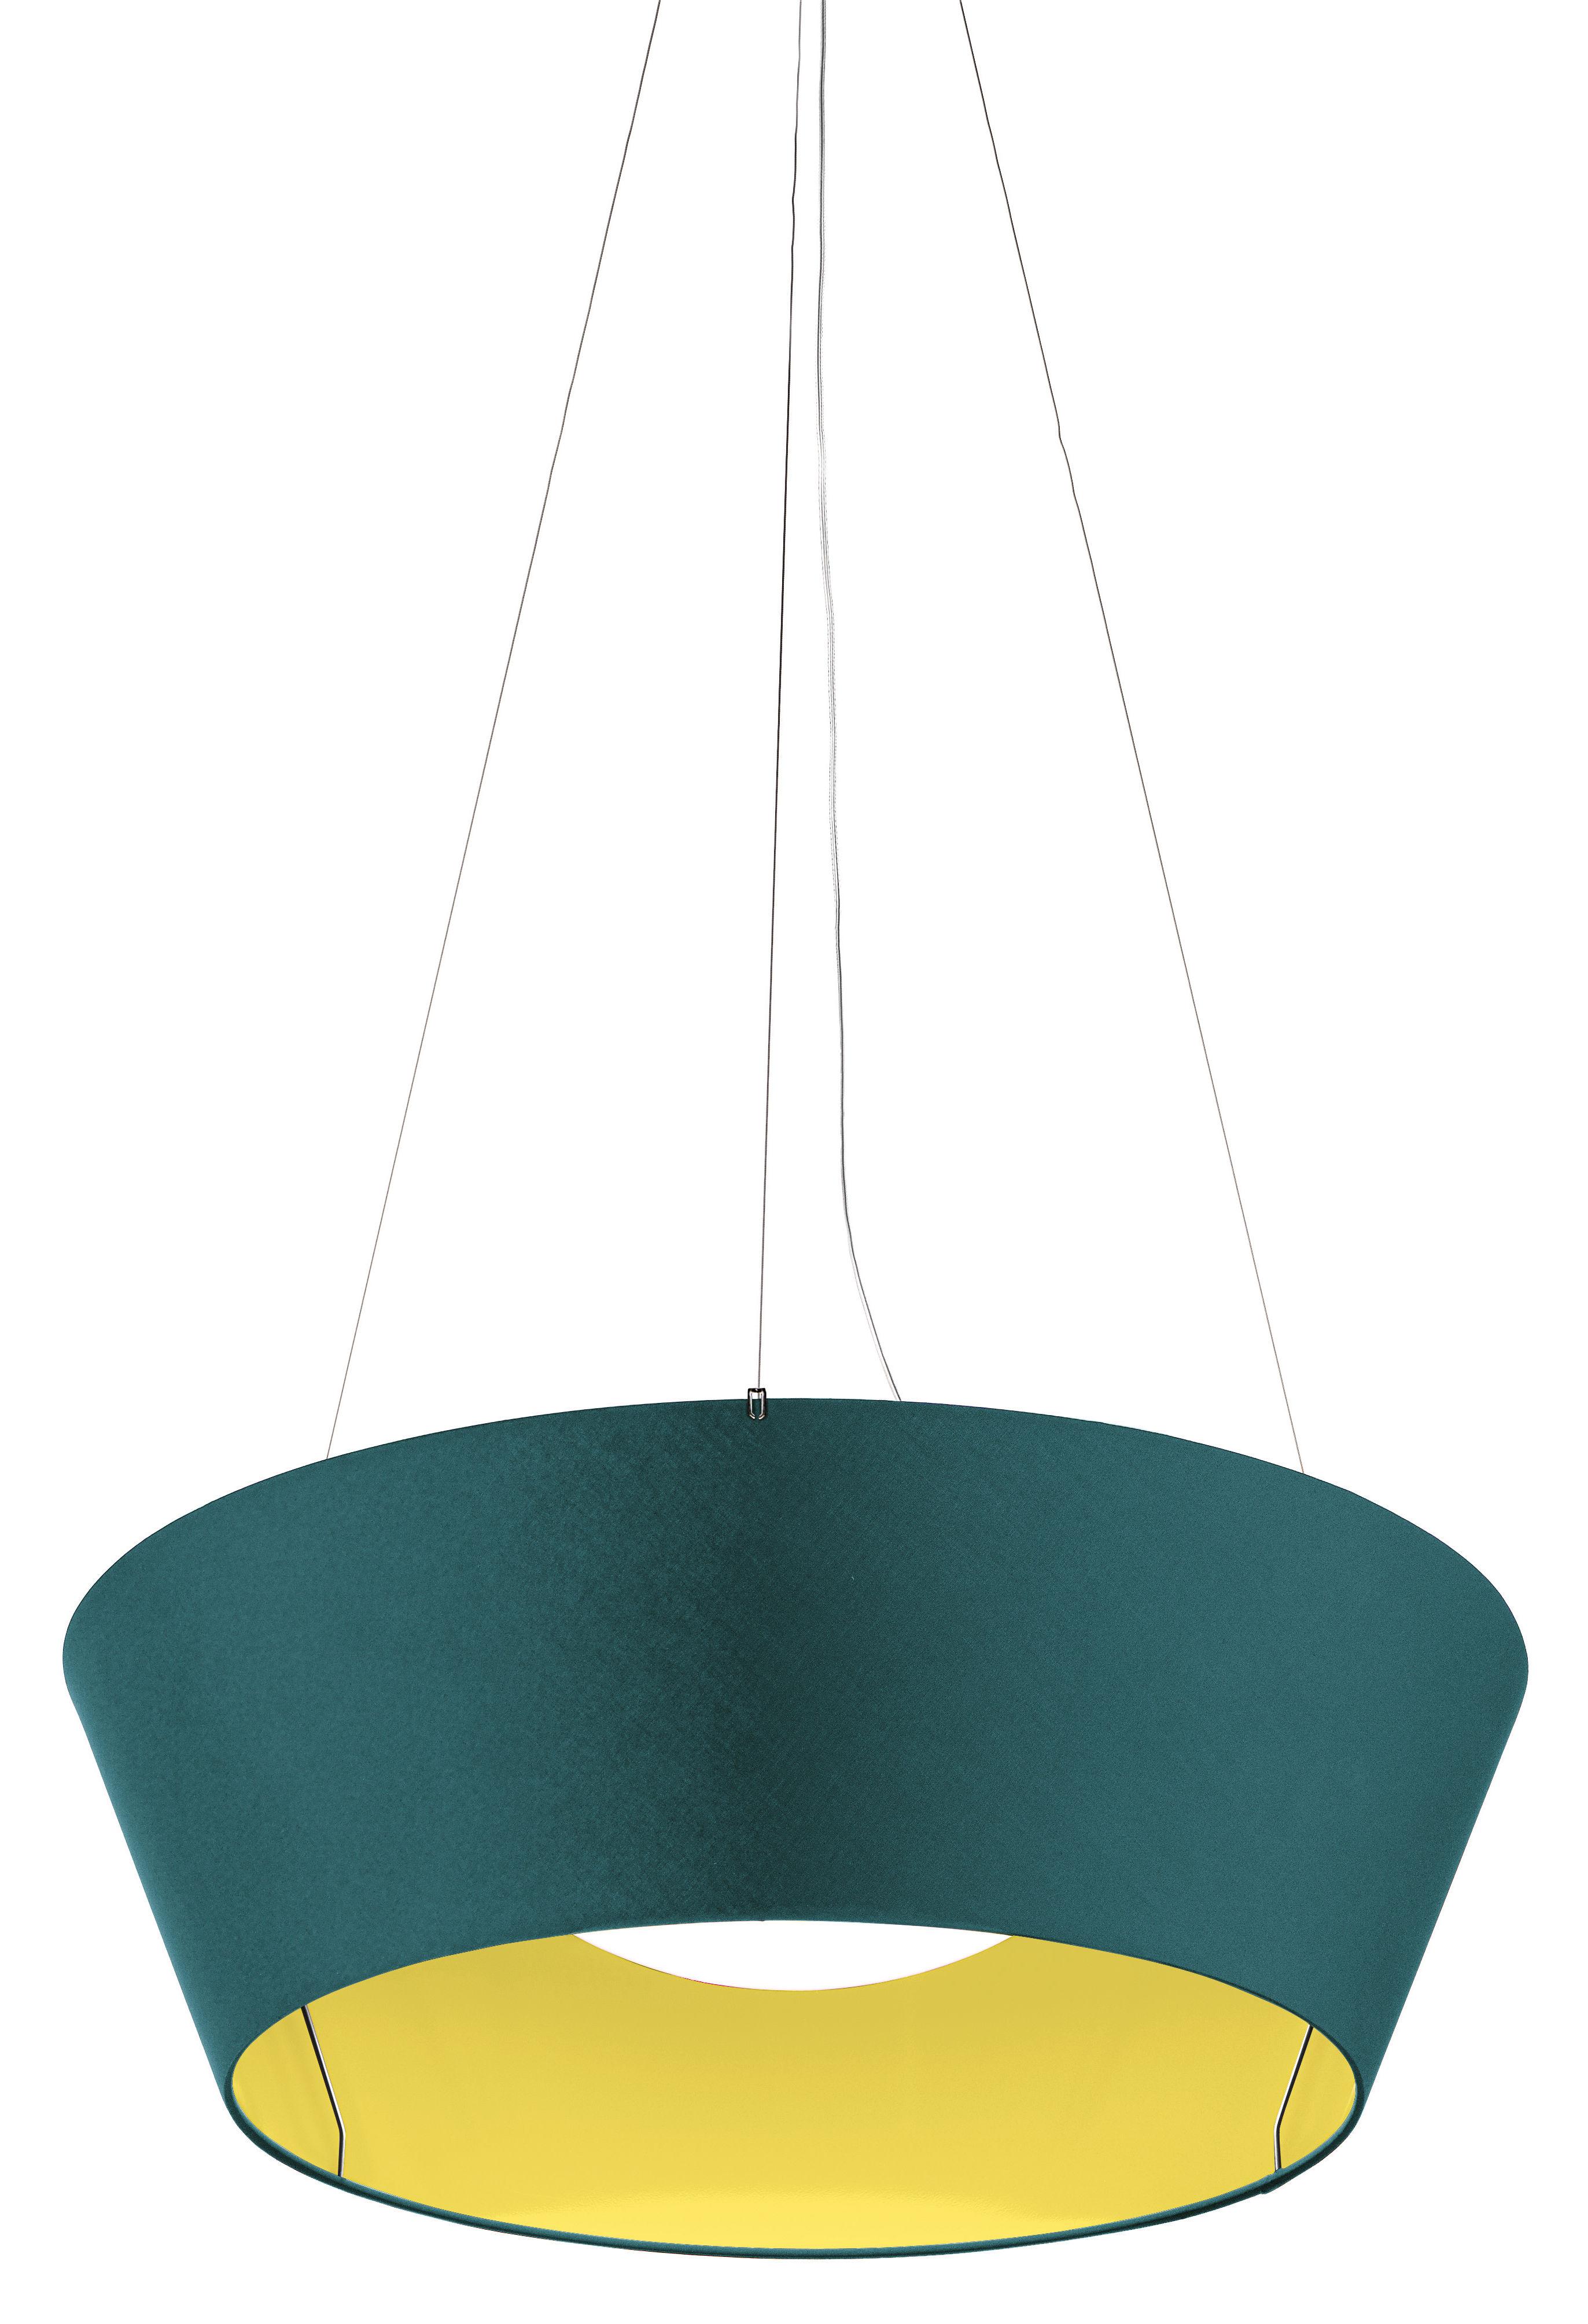 Lighting - Pendant Lighting - Reverse LED Pendant - / Ø 60 cm - Reversible by Modoluce - Dark Blue - Intérior : Yellow - Cotton